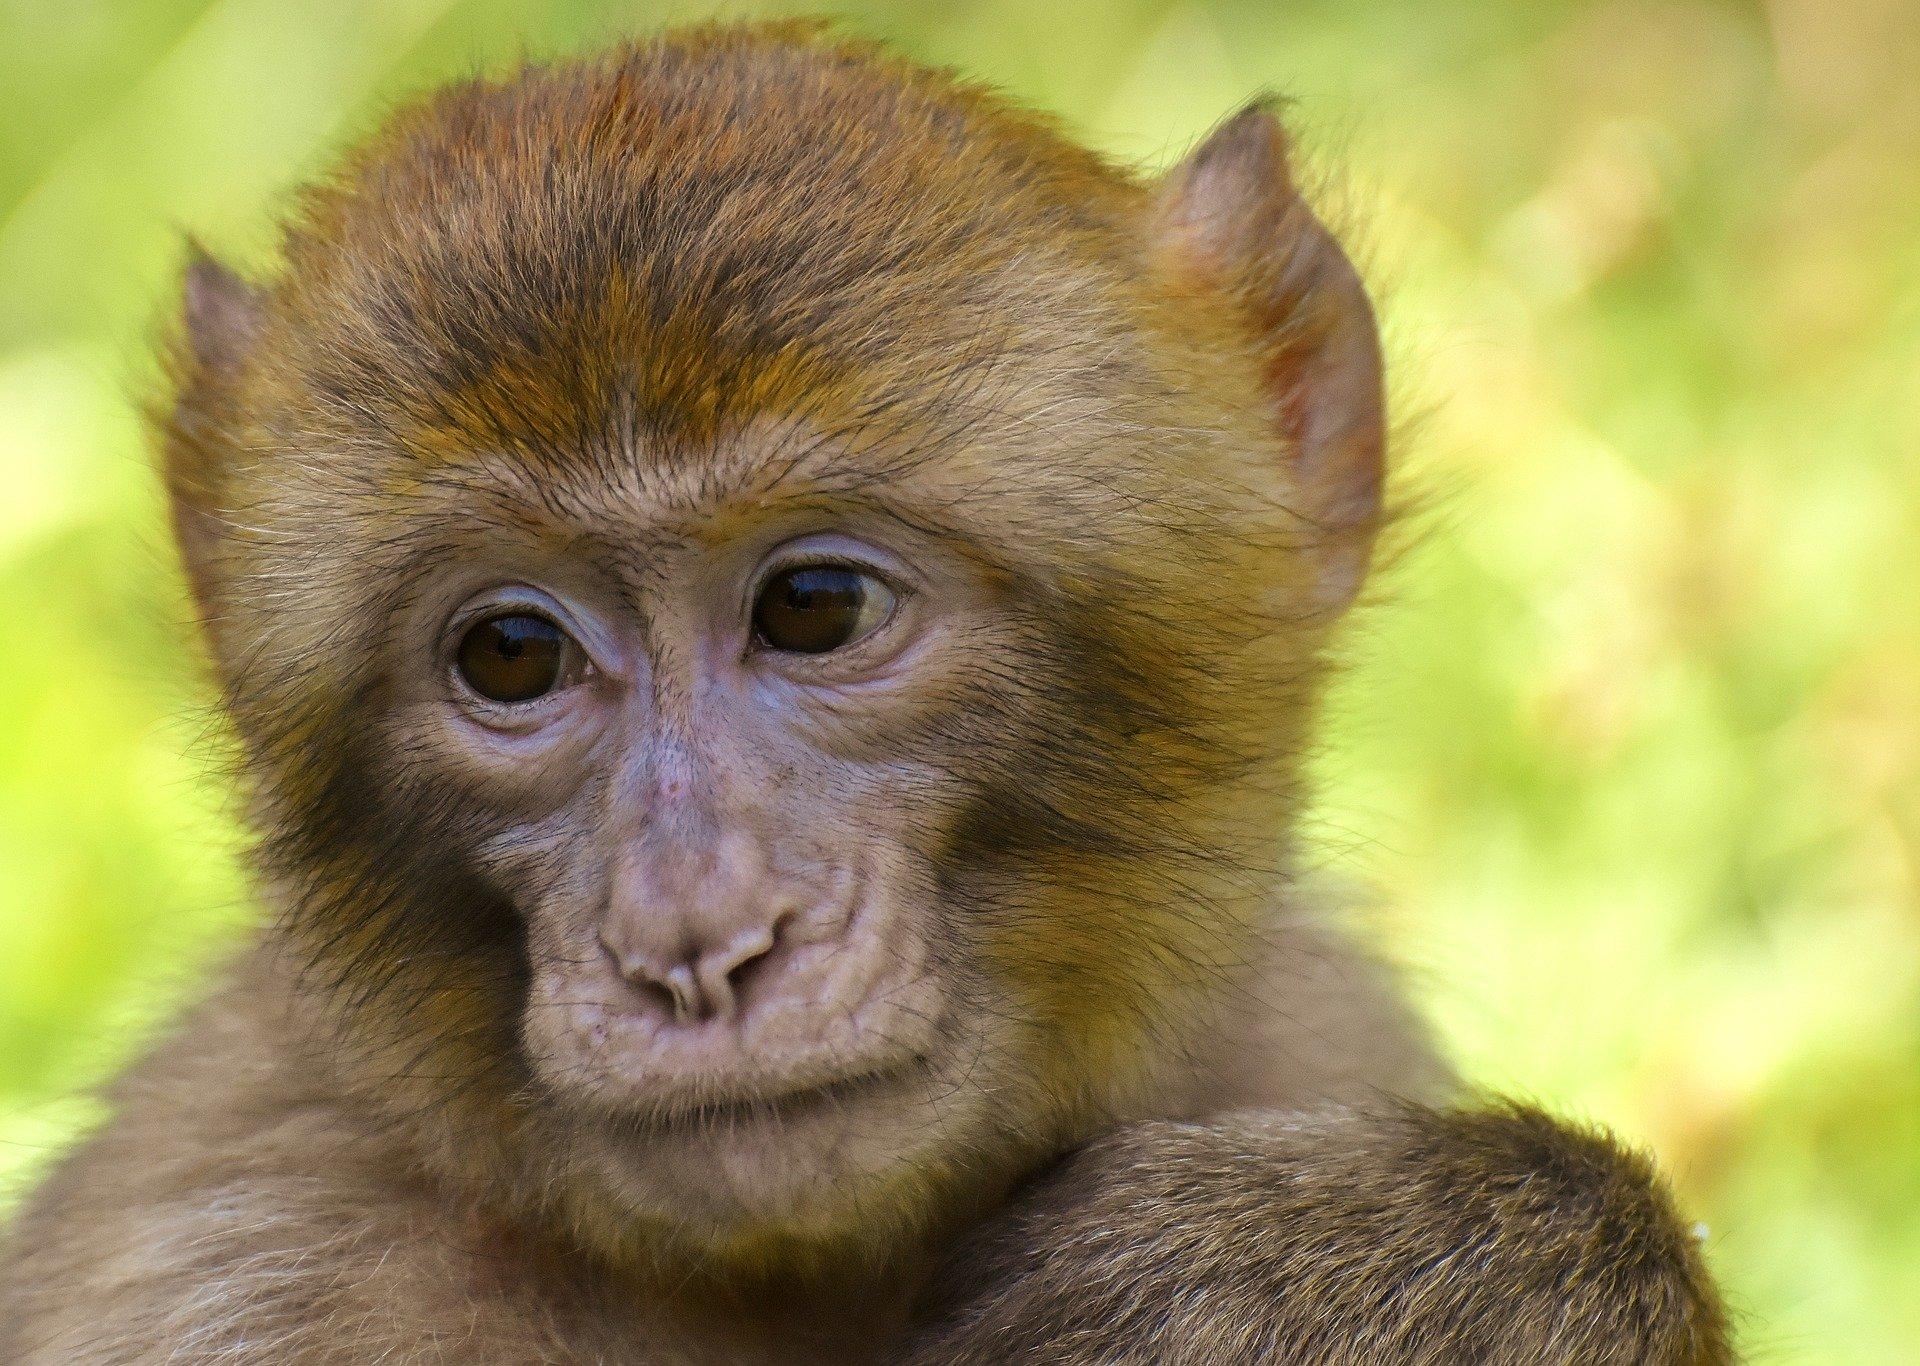 barbary-ape-3562358_1920